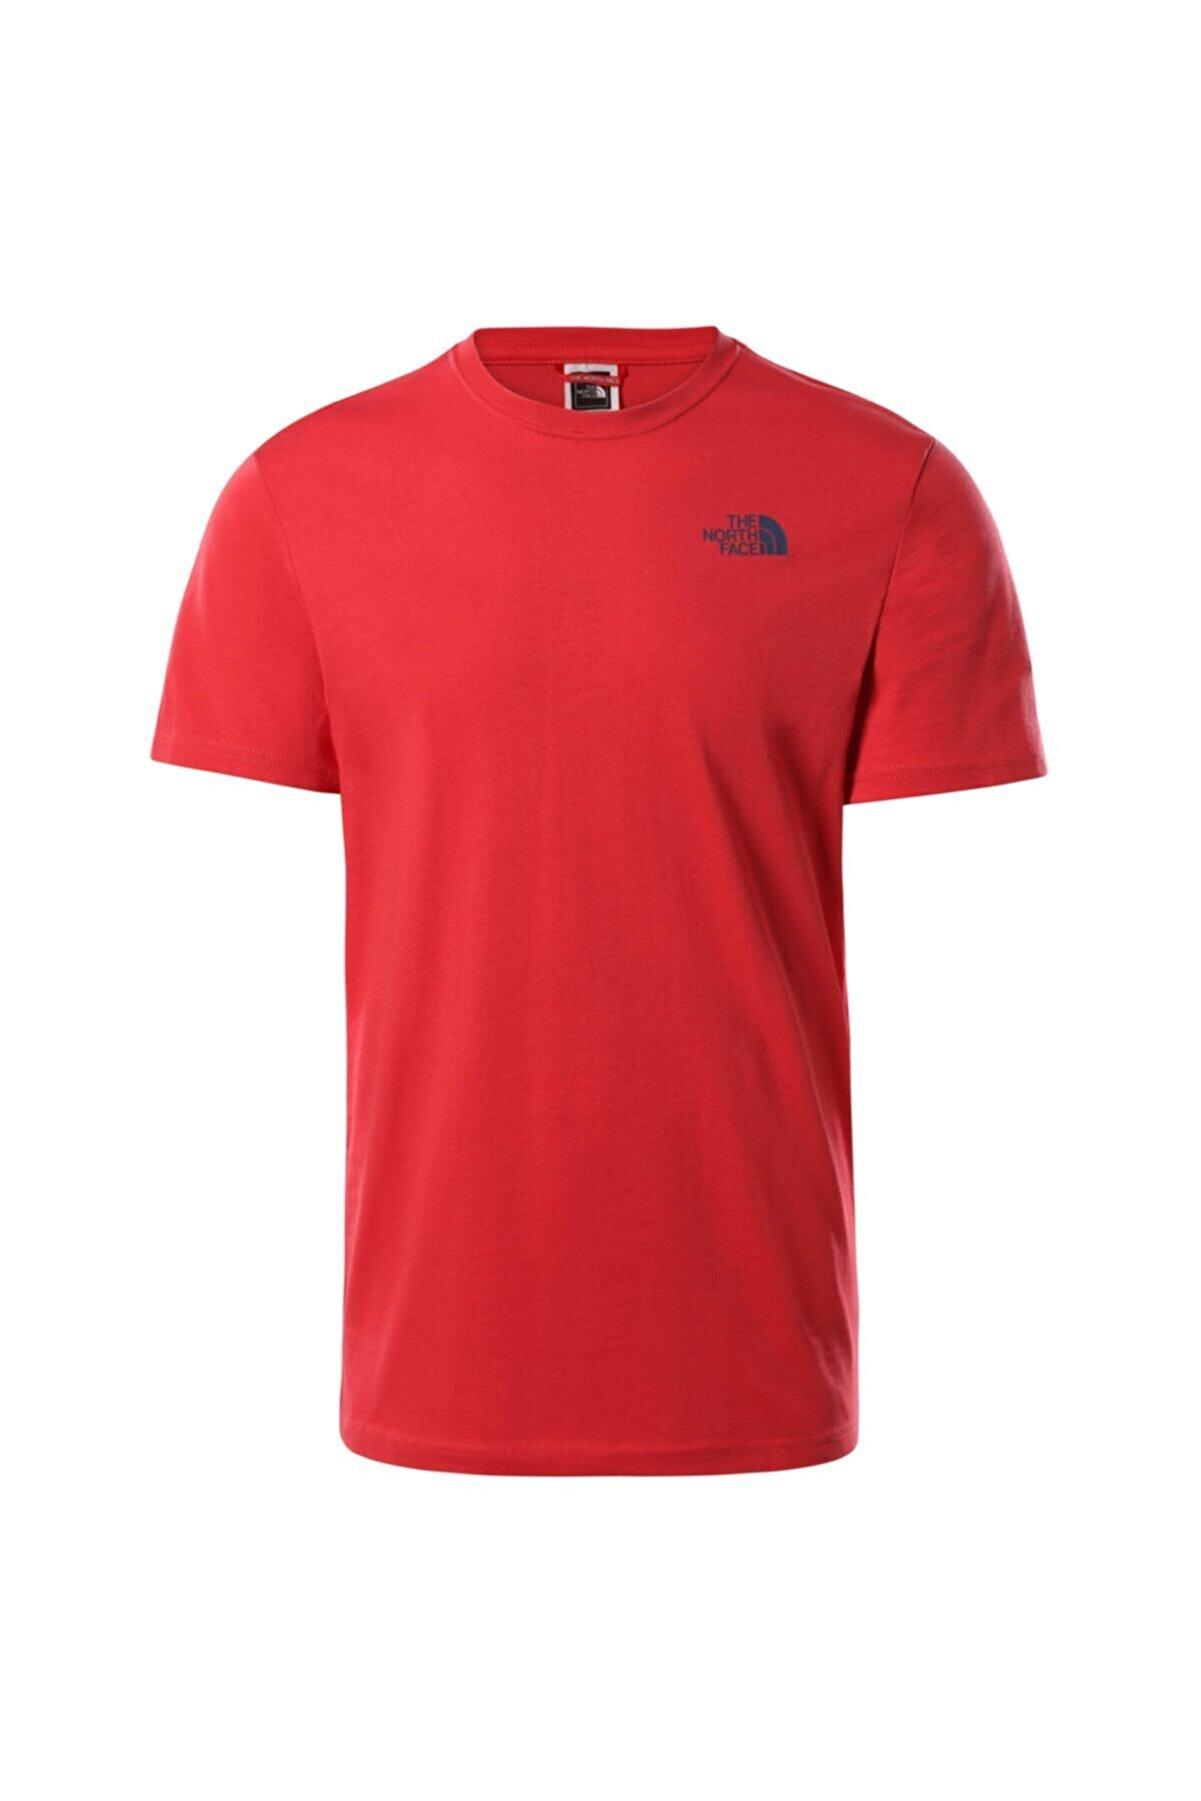 The North Face Erkek Kırmızı Redbox Celebration Tee T-shirt T92zxev34